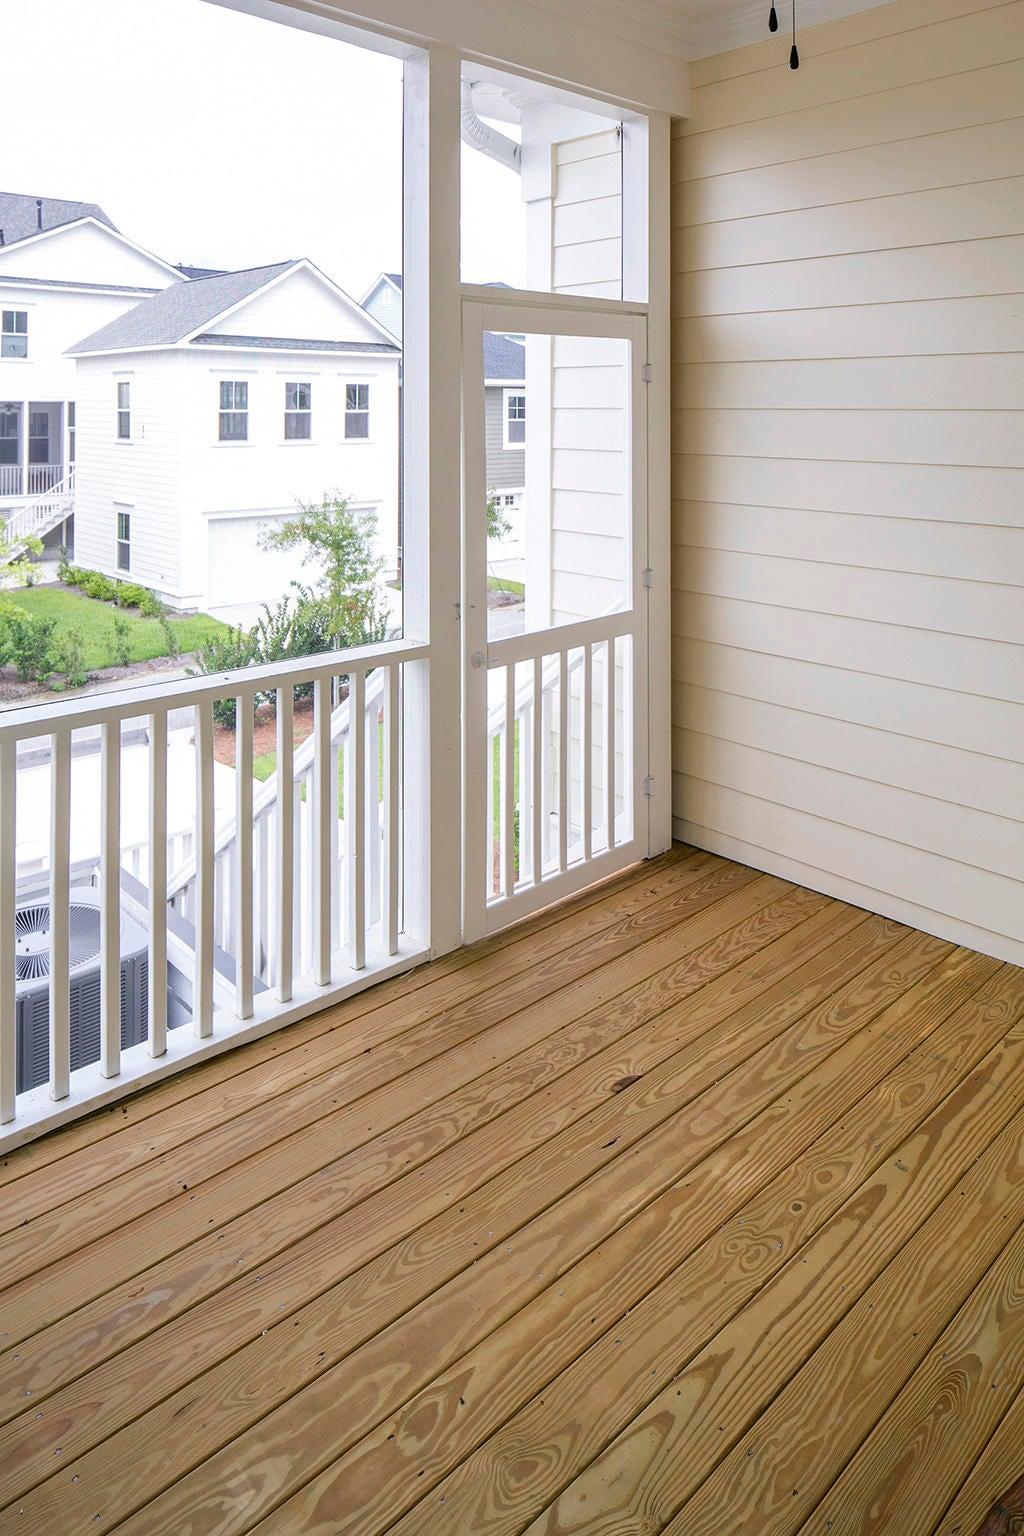 Daniel Island Homes For Sale - 1713 Frissel, Daniel Island, SC - 5